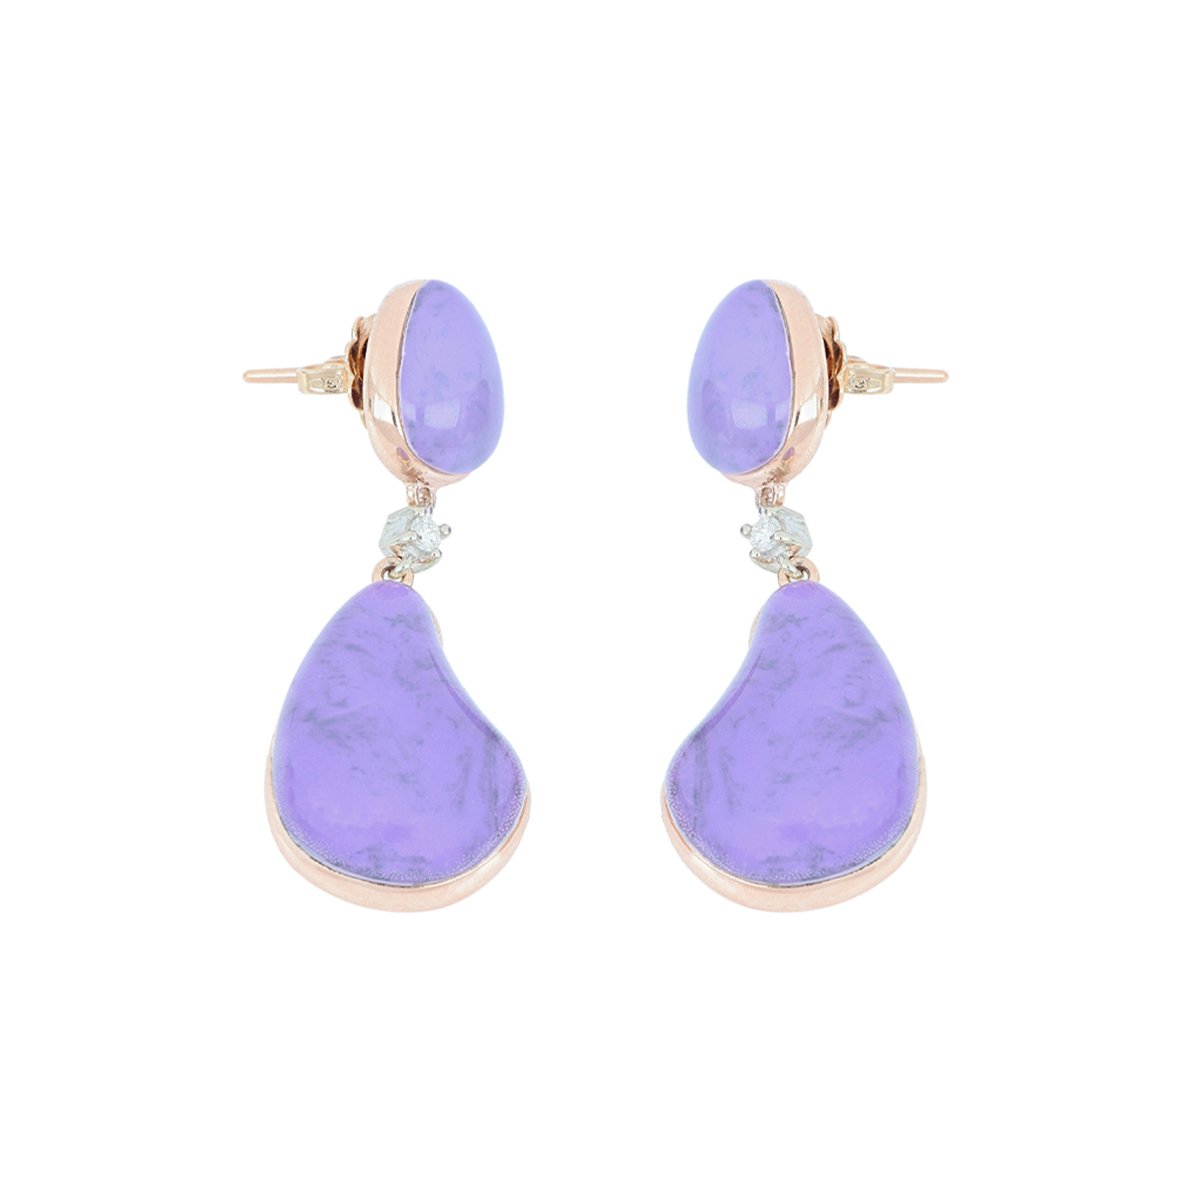 Cabochon Cut Quartz And Sugilite Stone Earrings